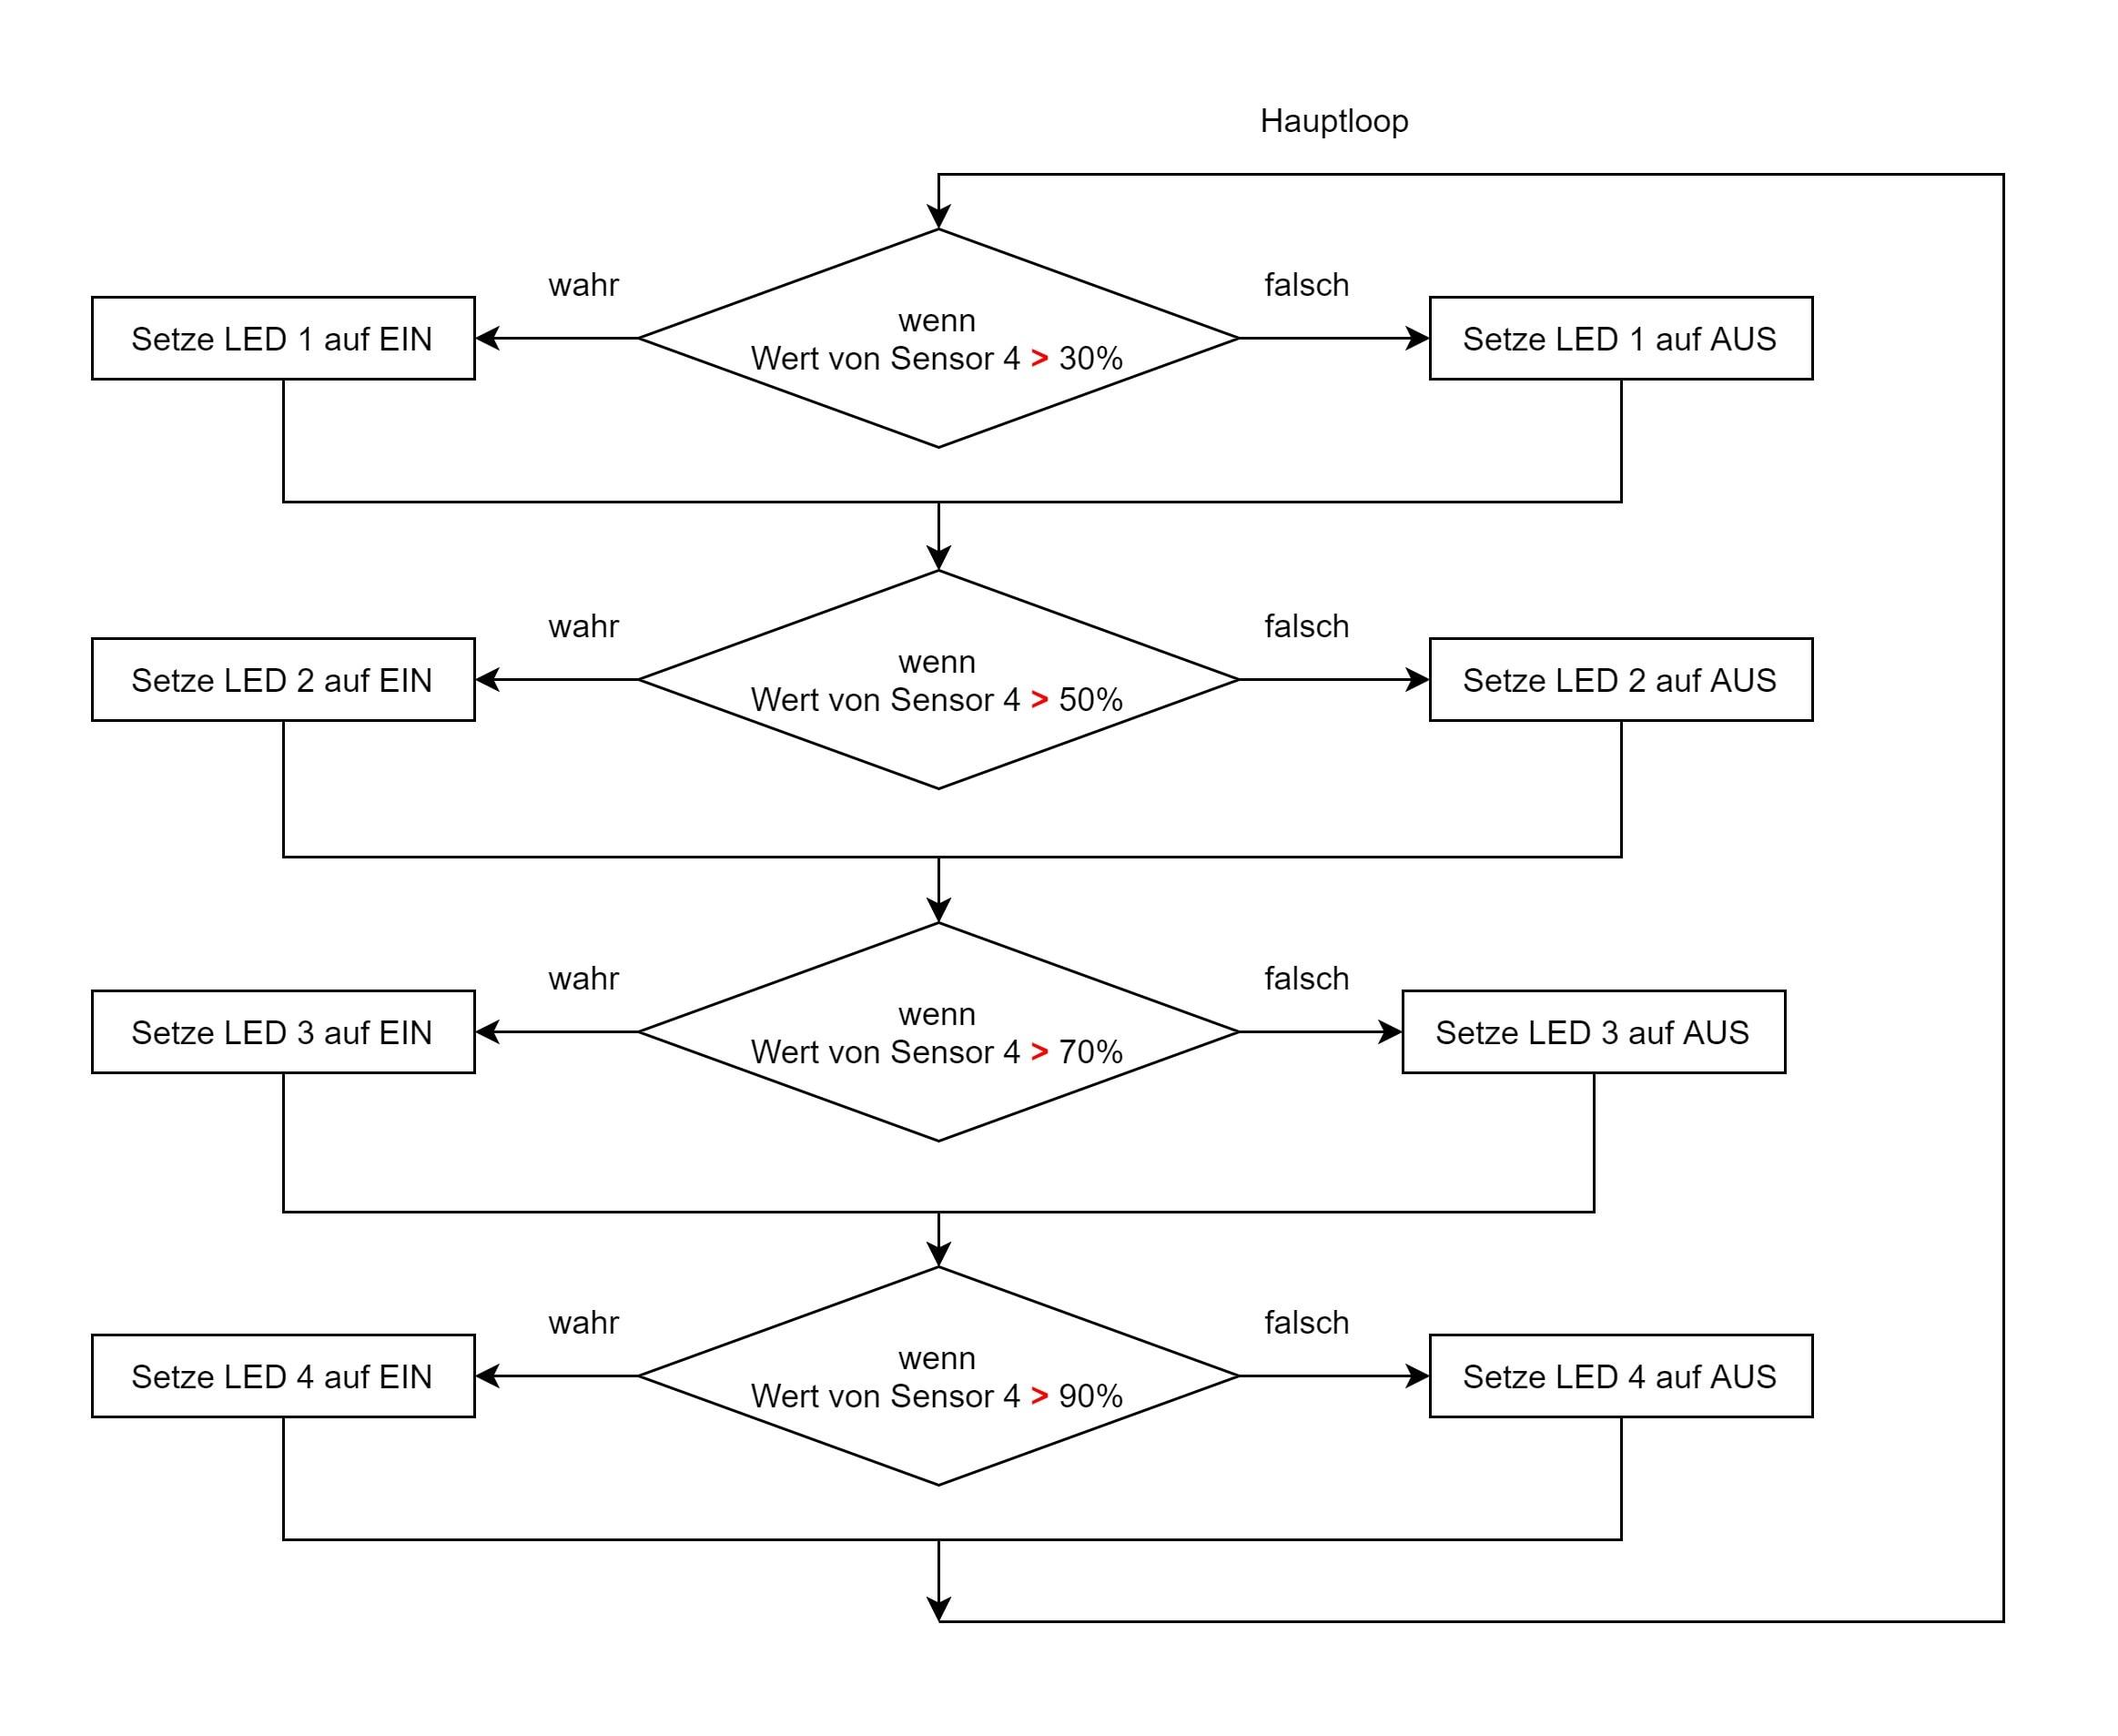 Flussdiagramm-if-then-else